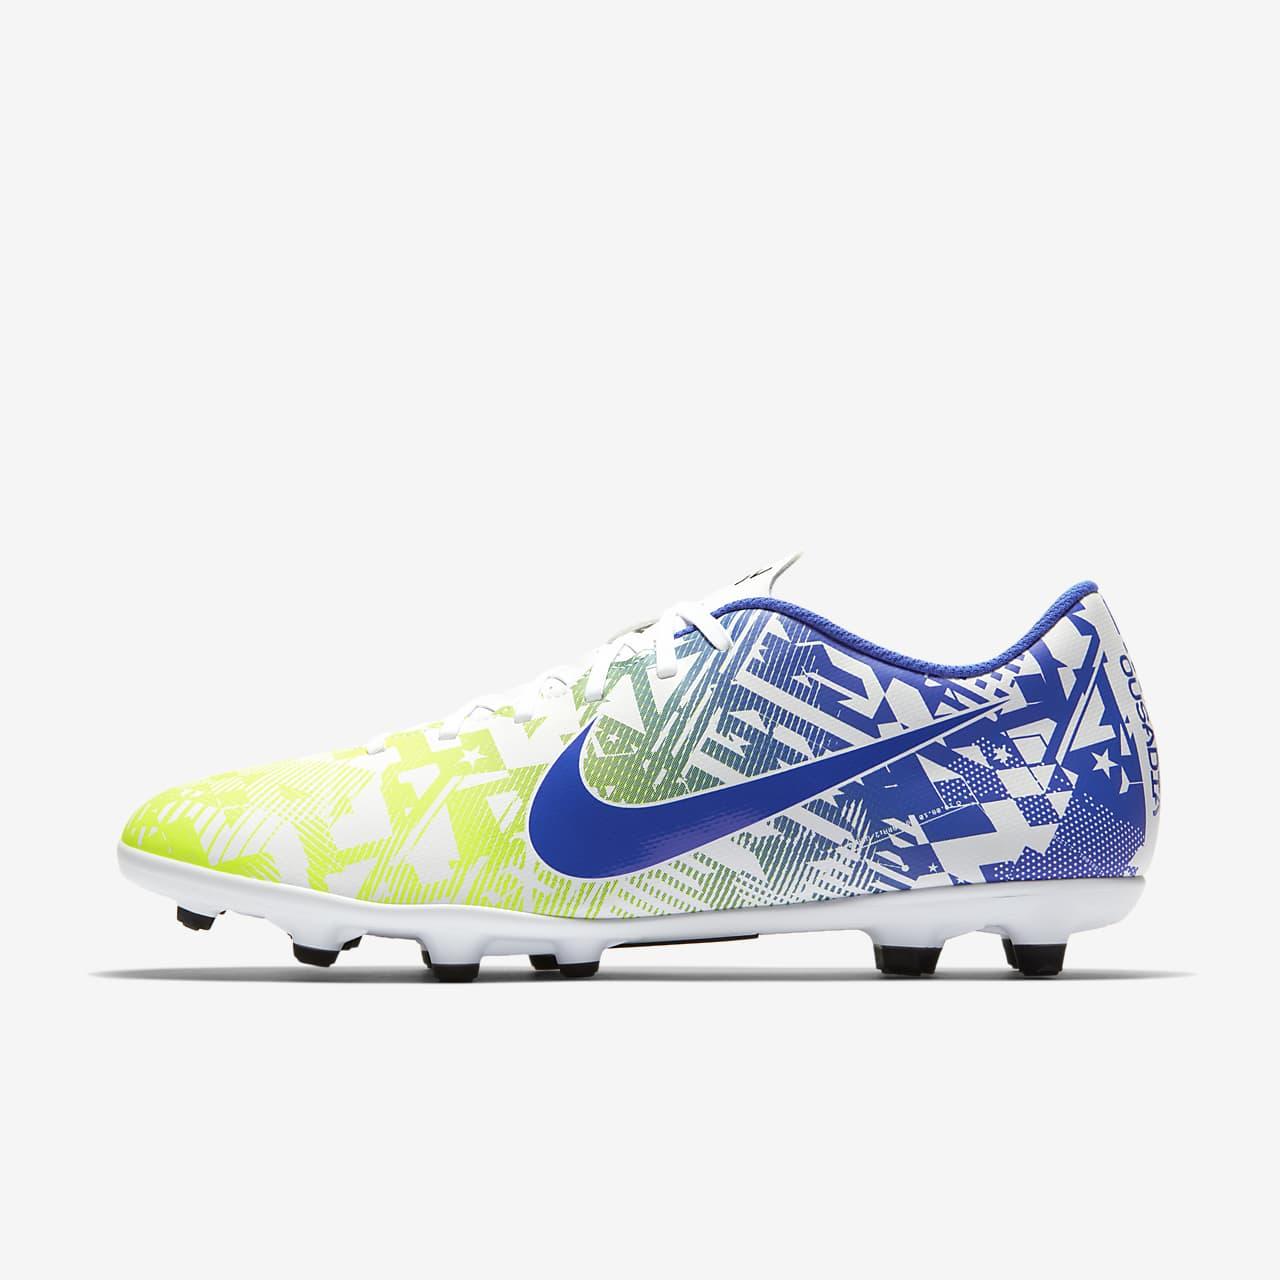 Eh Potencial nuestra  Nike Mercurial Vapor 13 Club Neymar Jr. MG Multi-Ground Football Boot. Nike  LU